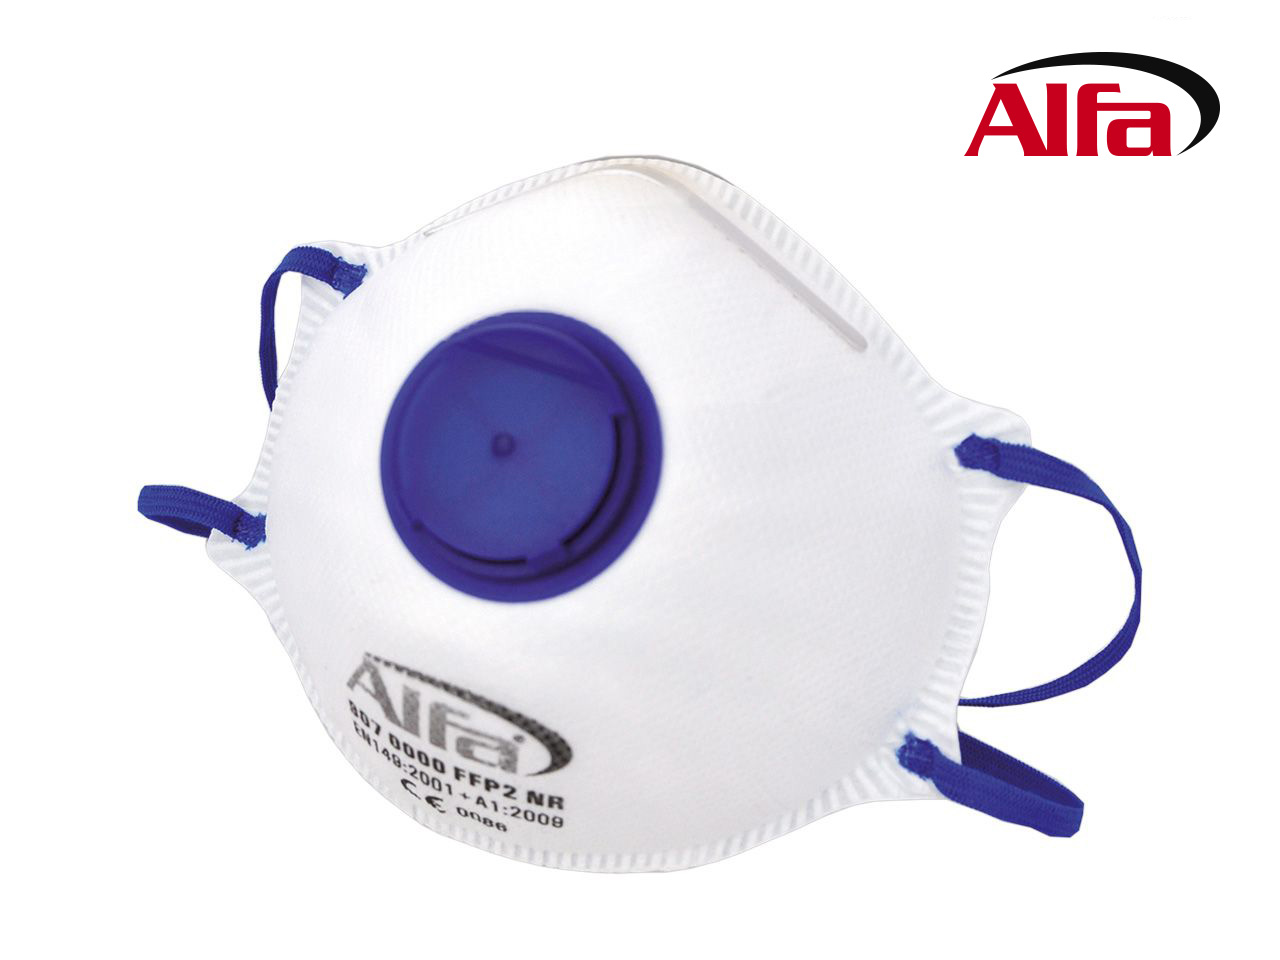 907 Alfa Feinstaubmaske FFP2